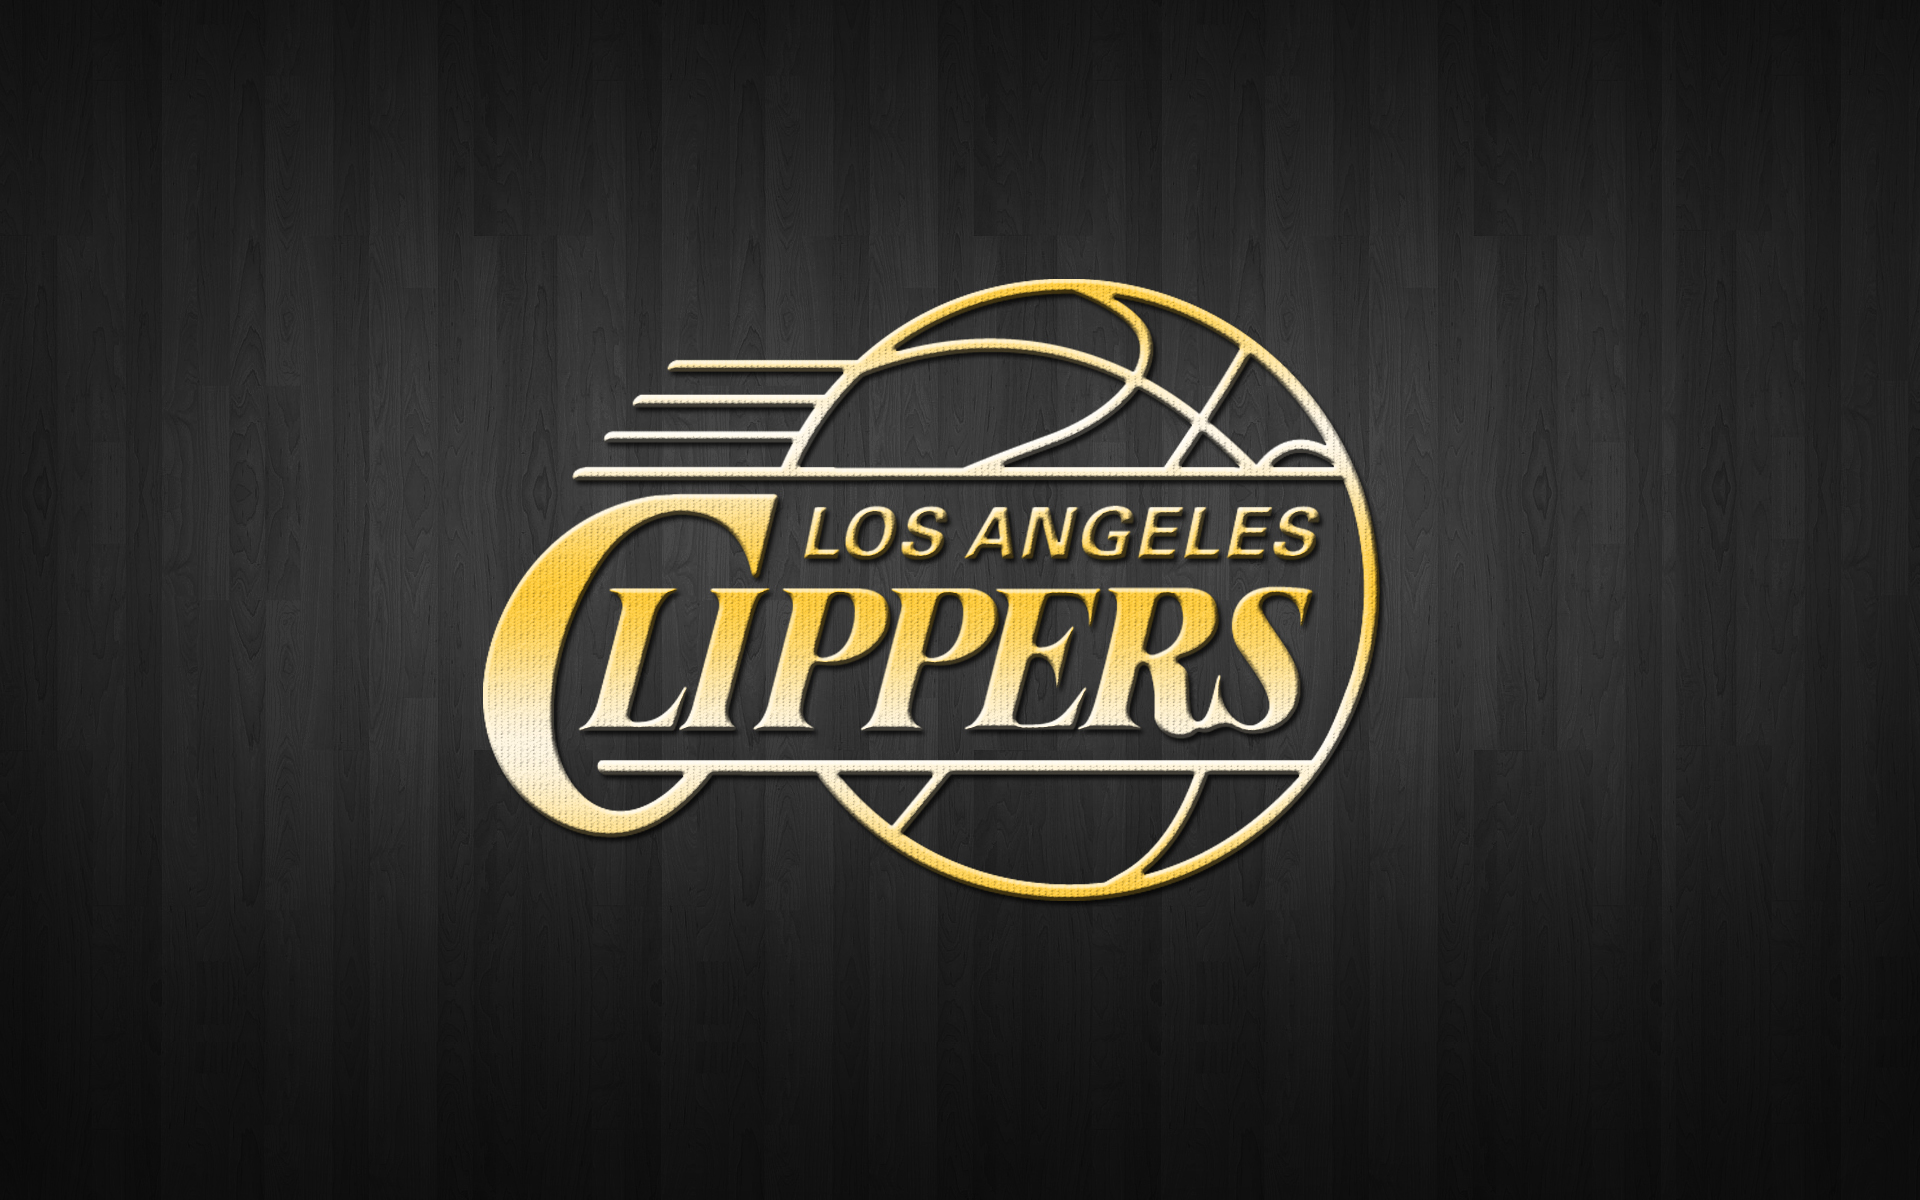 Basketball, Nba, Los Angeles Clippers, Logo Wallpaper - Los Angeles Clippers , HD Wallpaper & Backgrounds